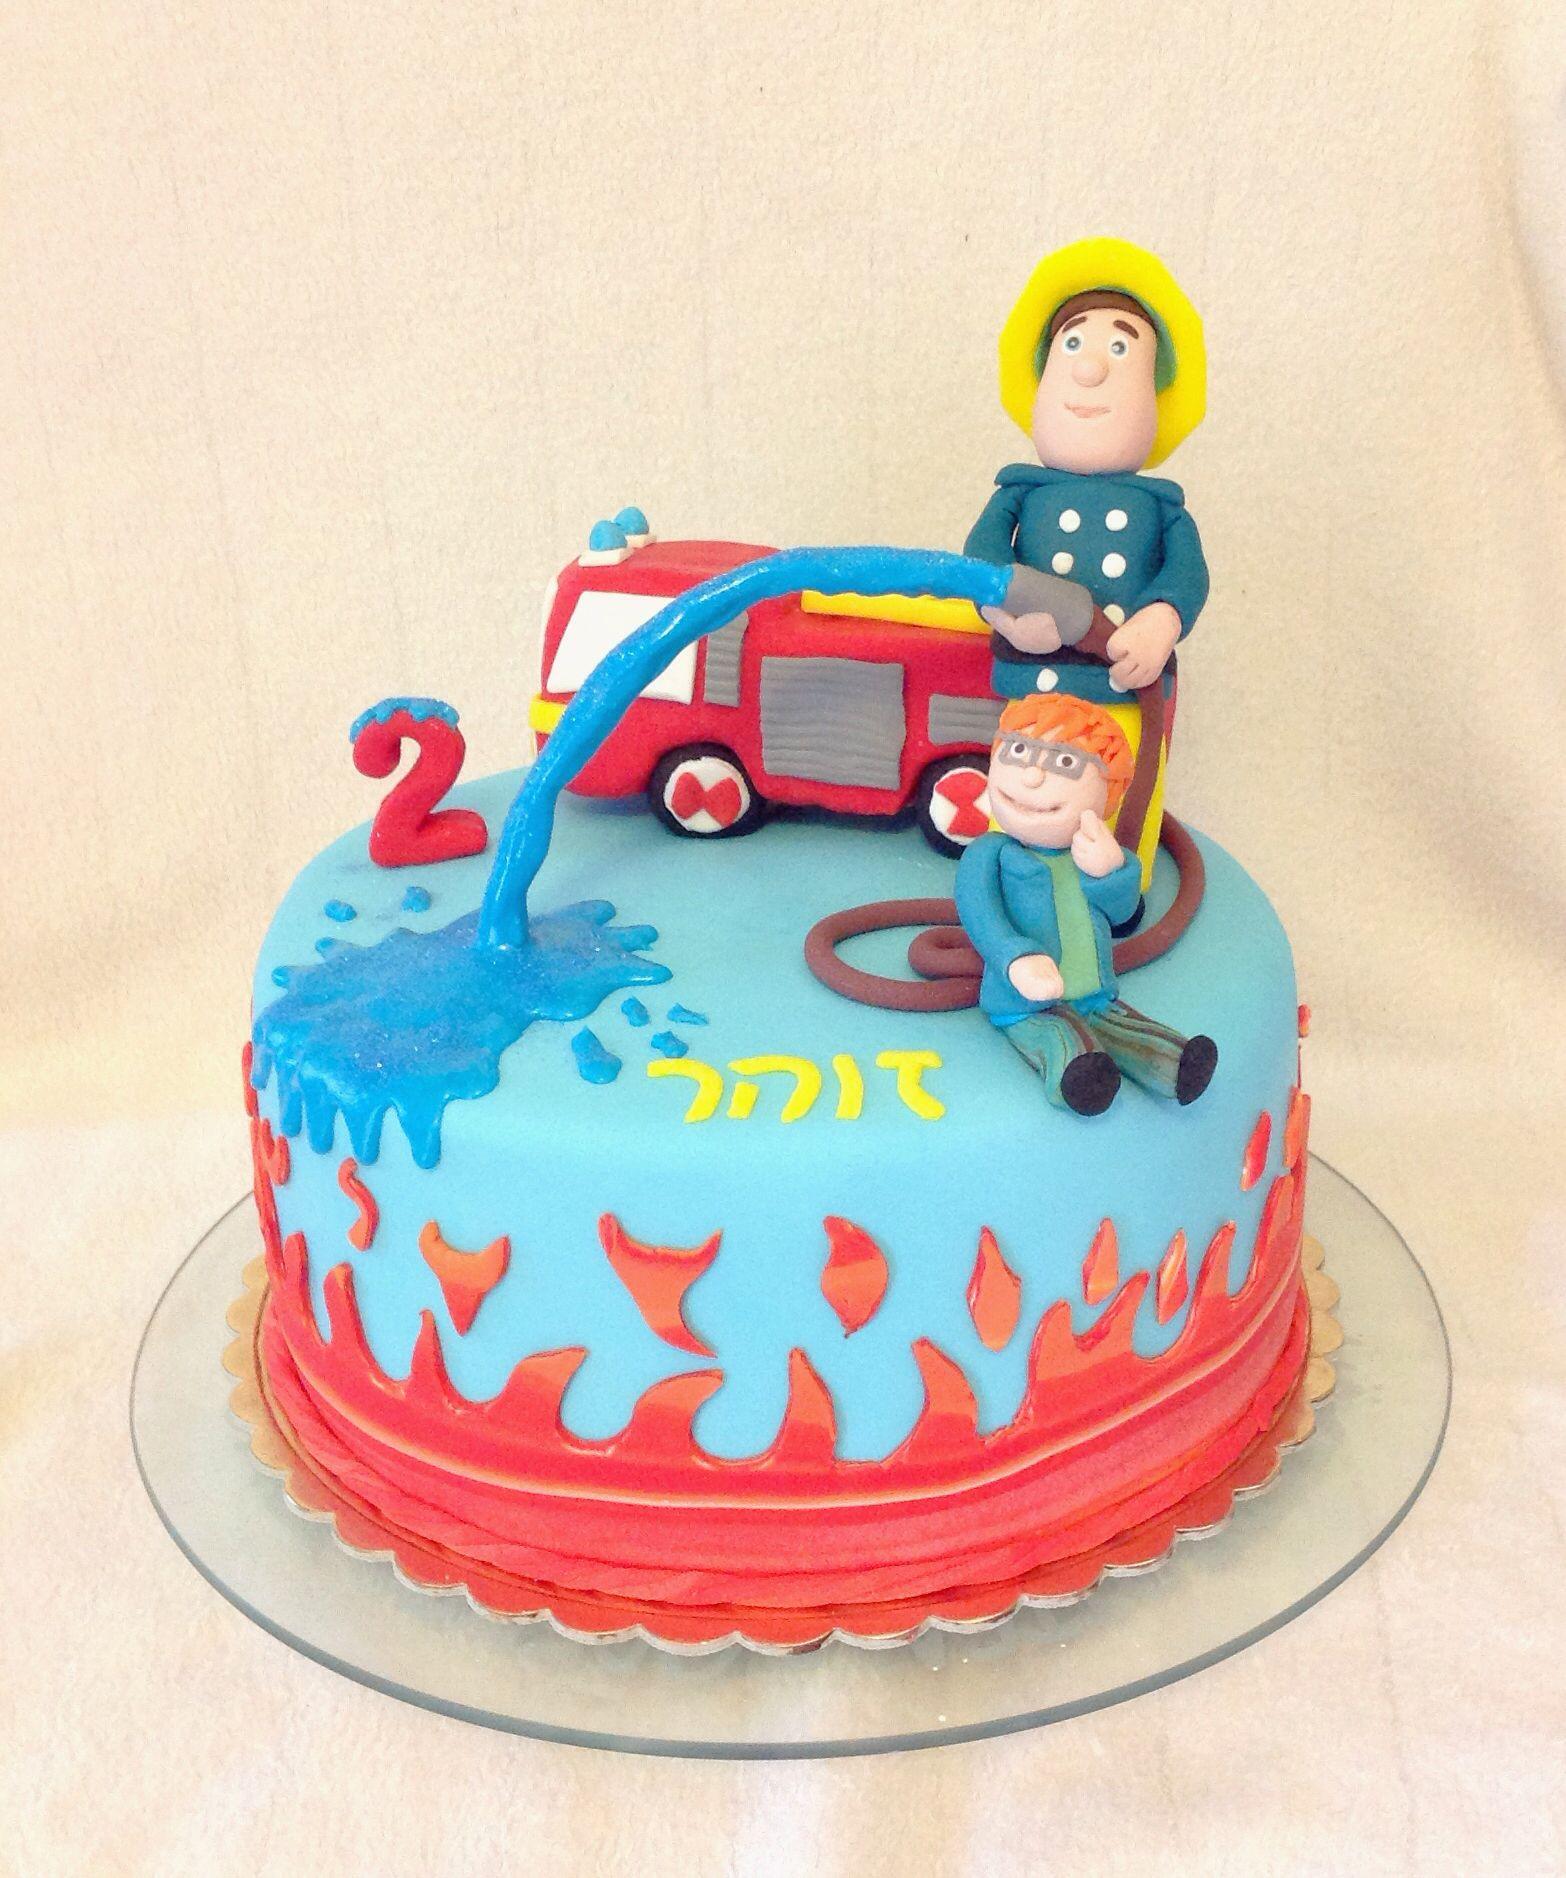 Firefighter Cupcake Decorations Fireman Sam Cake By Bellasbakery Cakesdecorcom Cake